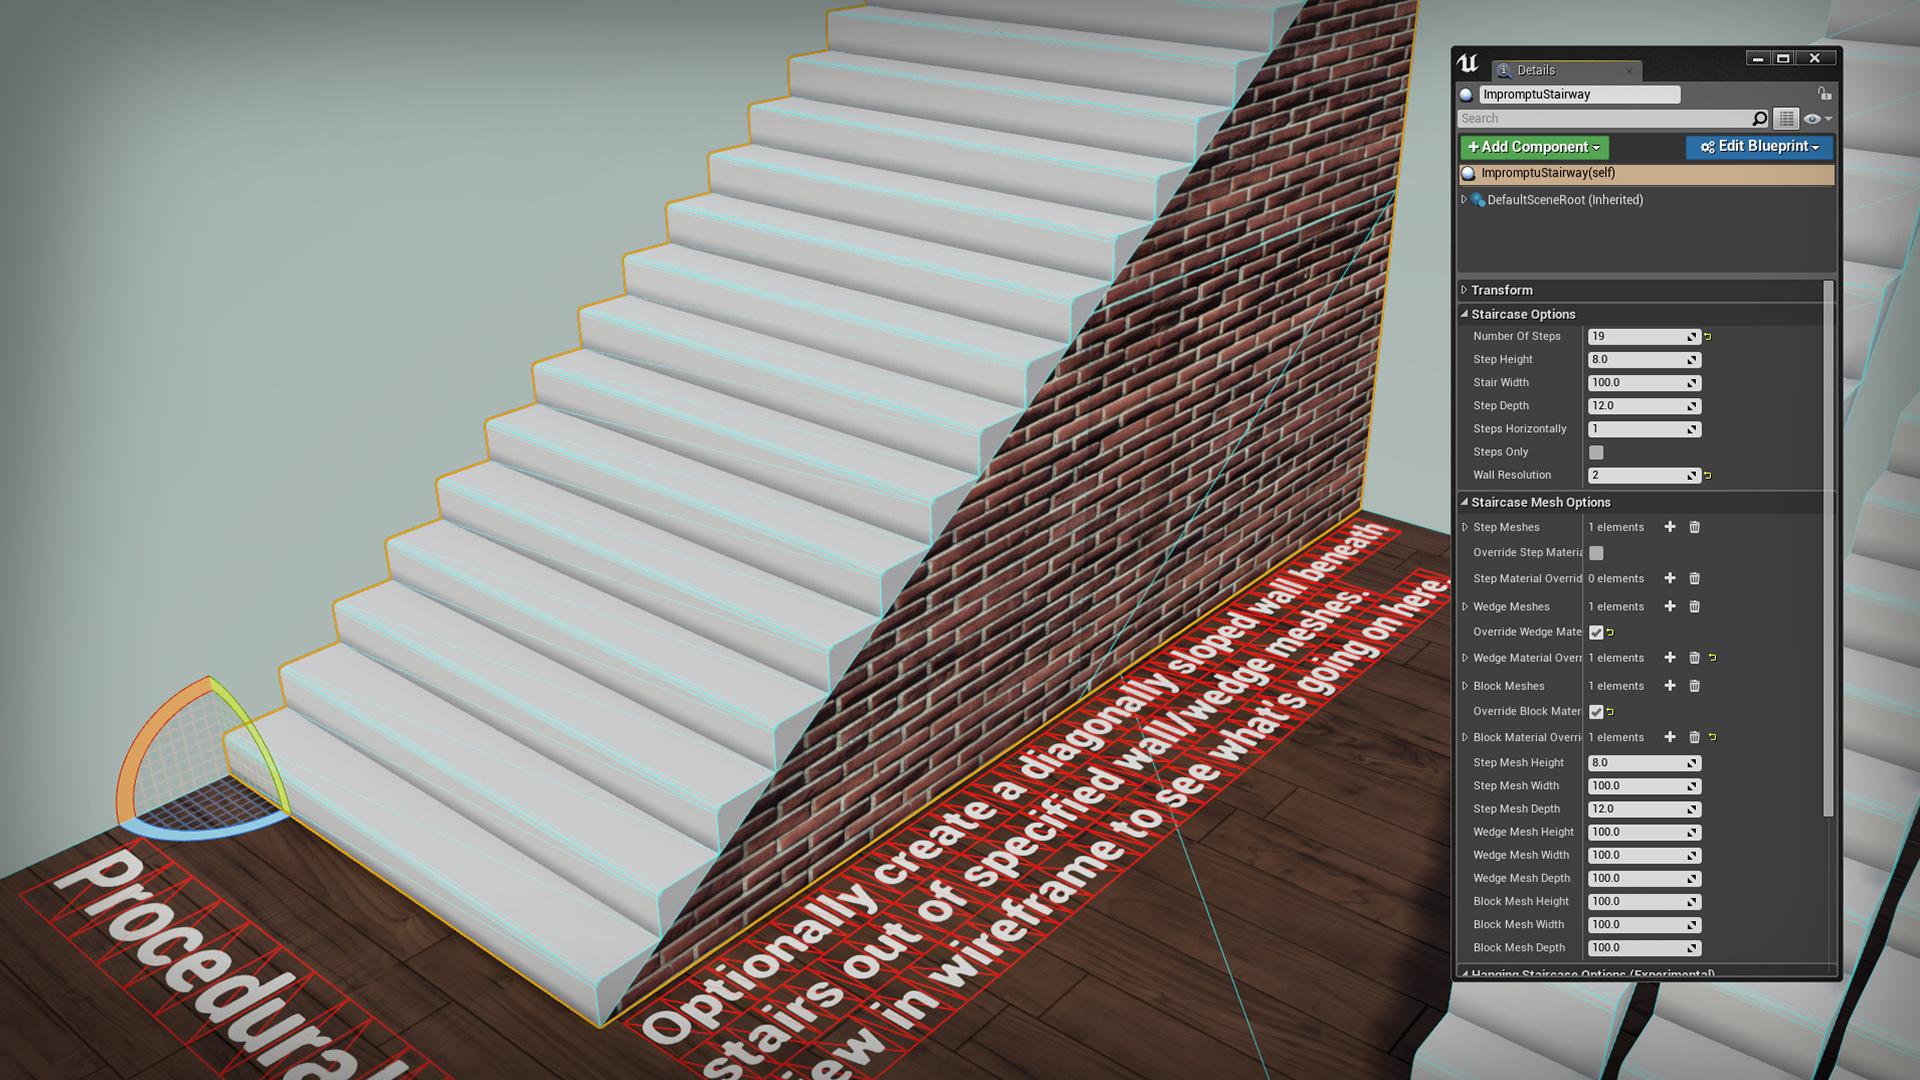 Impromptu Procedural Stairs By Impromptu Games In Blueprints Ue4